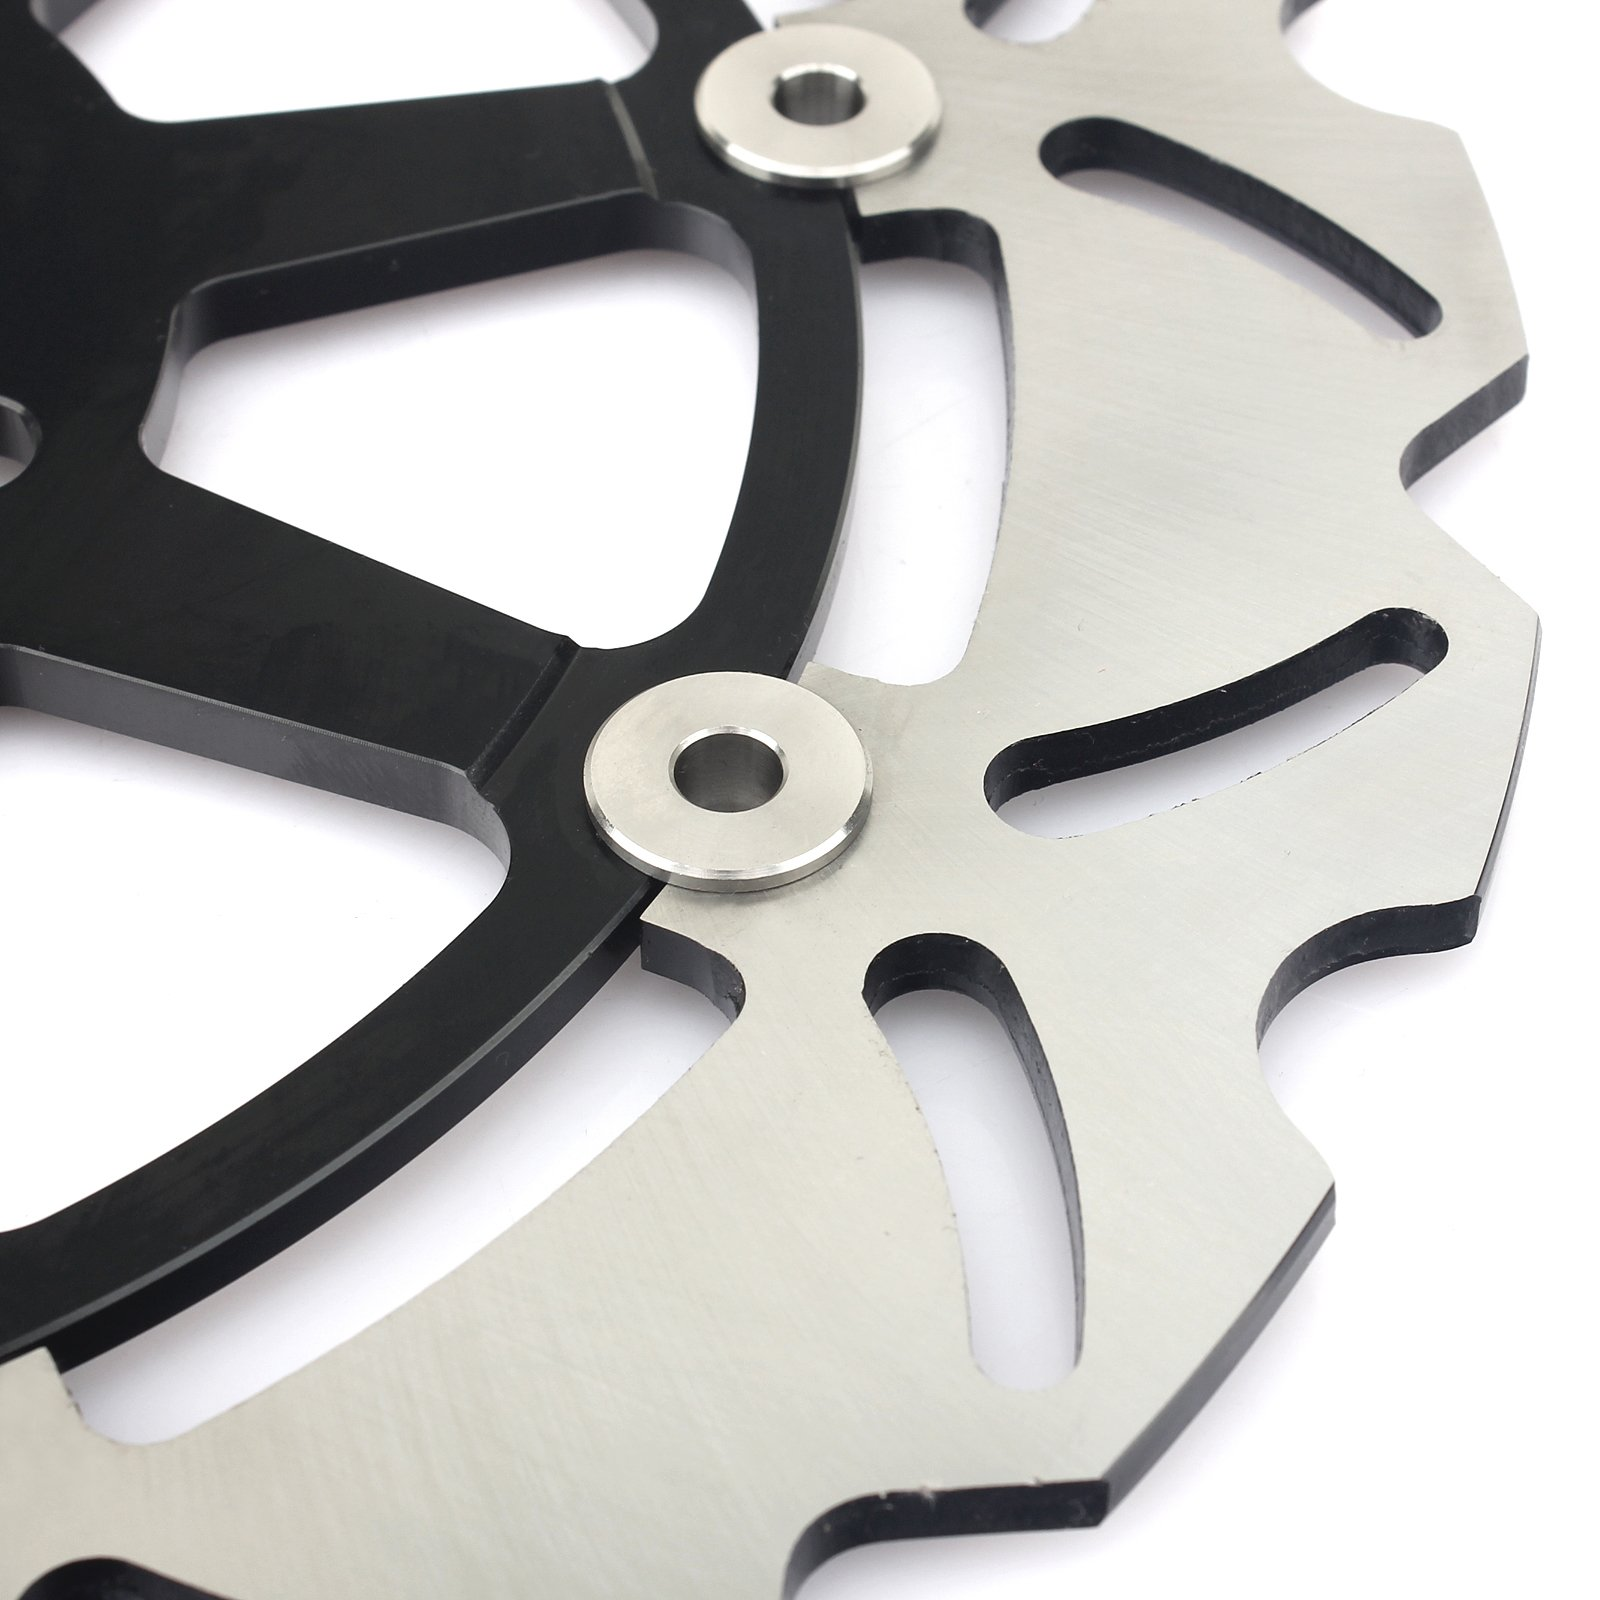 GSXR Front Brake Discs Rotors for Suzuki GSXR600 GSXR750 1997-2003 GSXR1000 2001 2002 Hayabusa GSX1300R 1999-2007 TL1000R TL1000S 98-01 by TARAZON (Image #4)